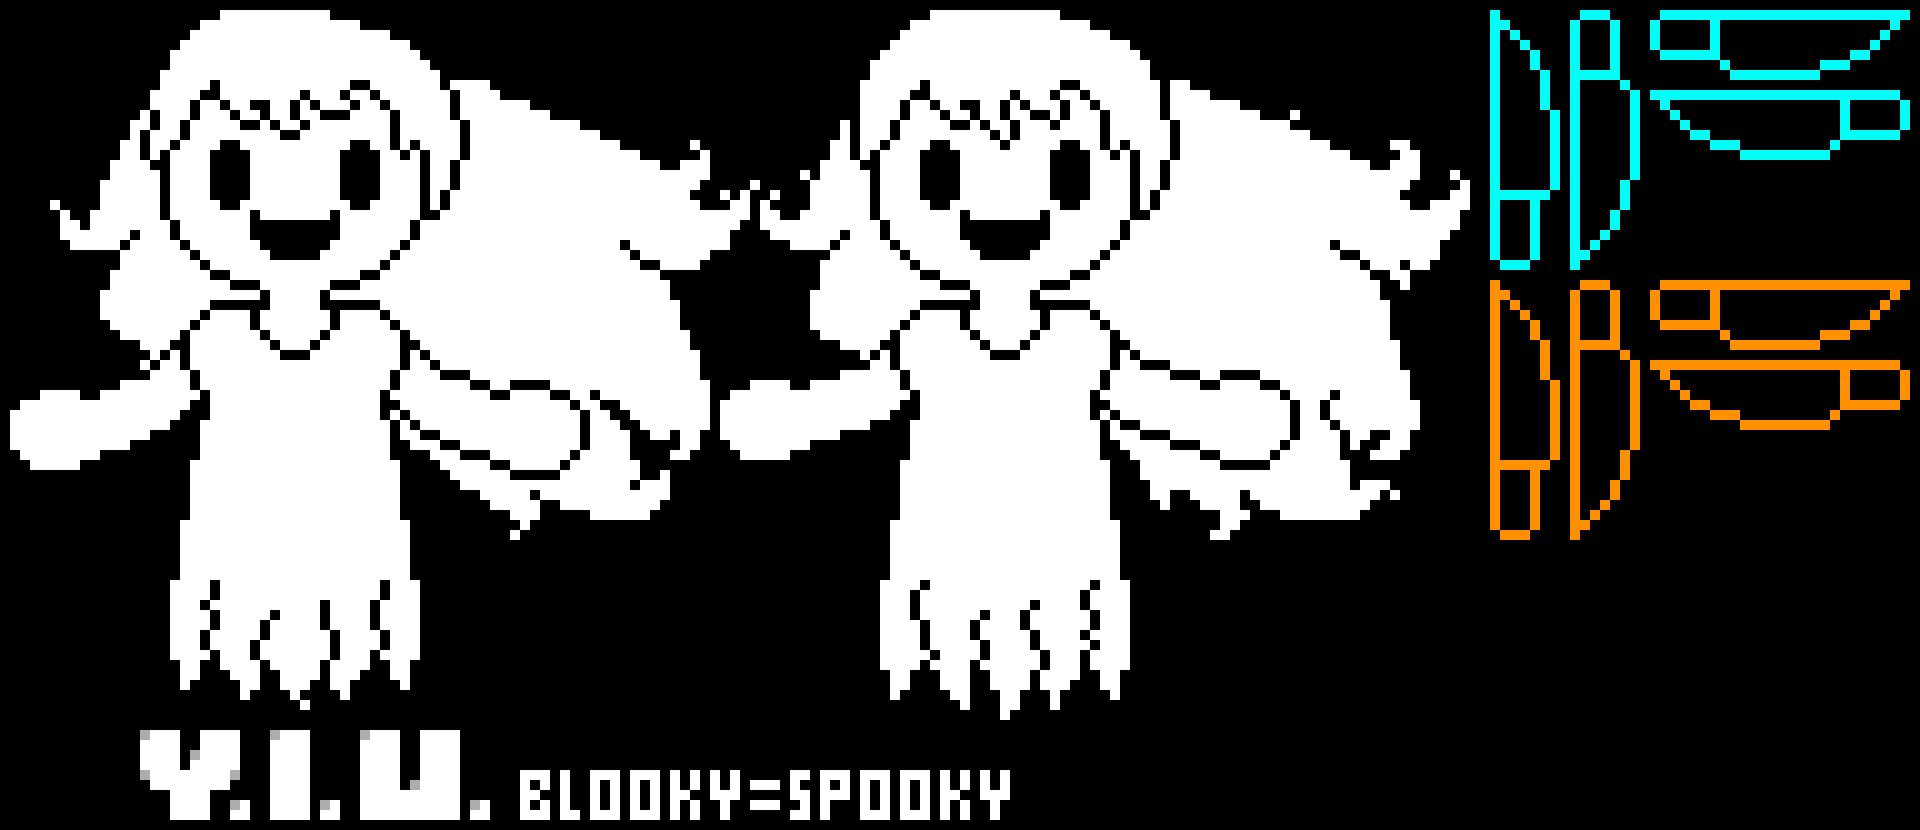 Your Indie Underground (My AU) Blooky = Spooky Battle Pt 2